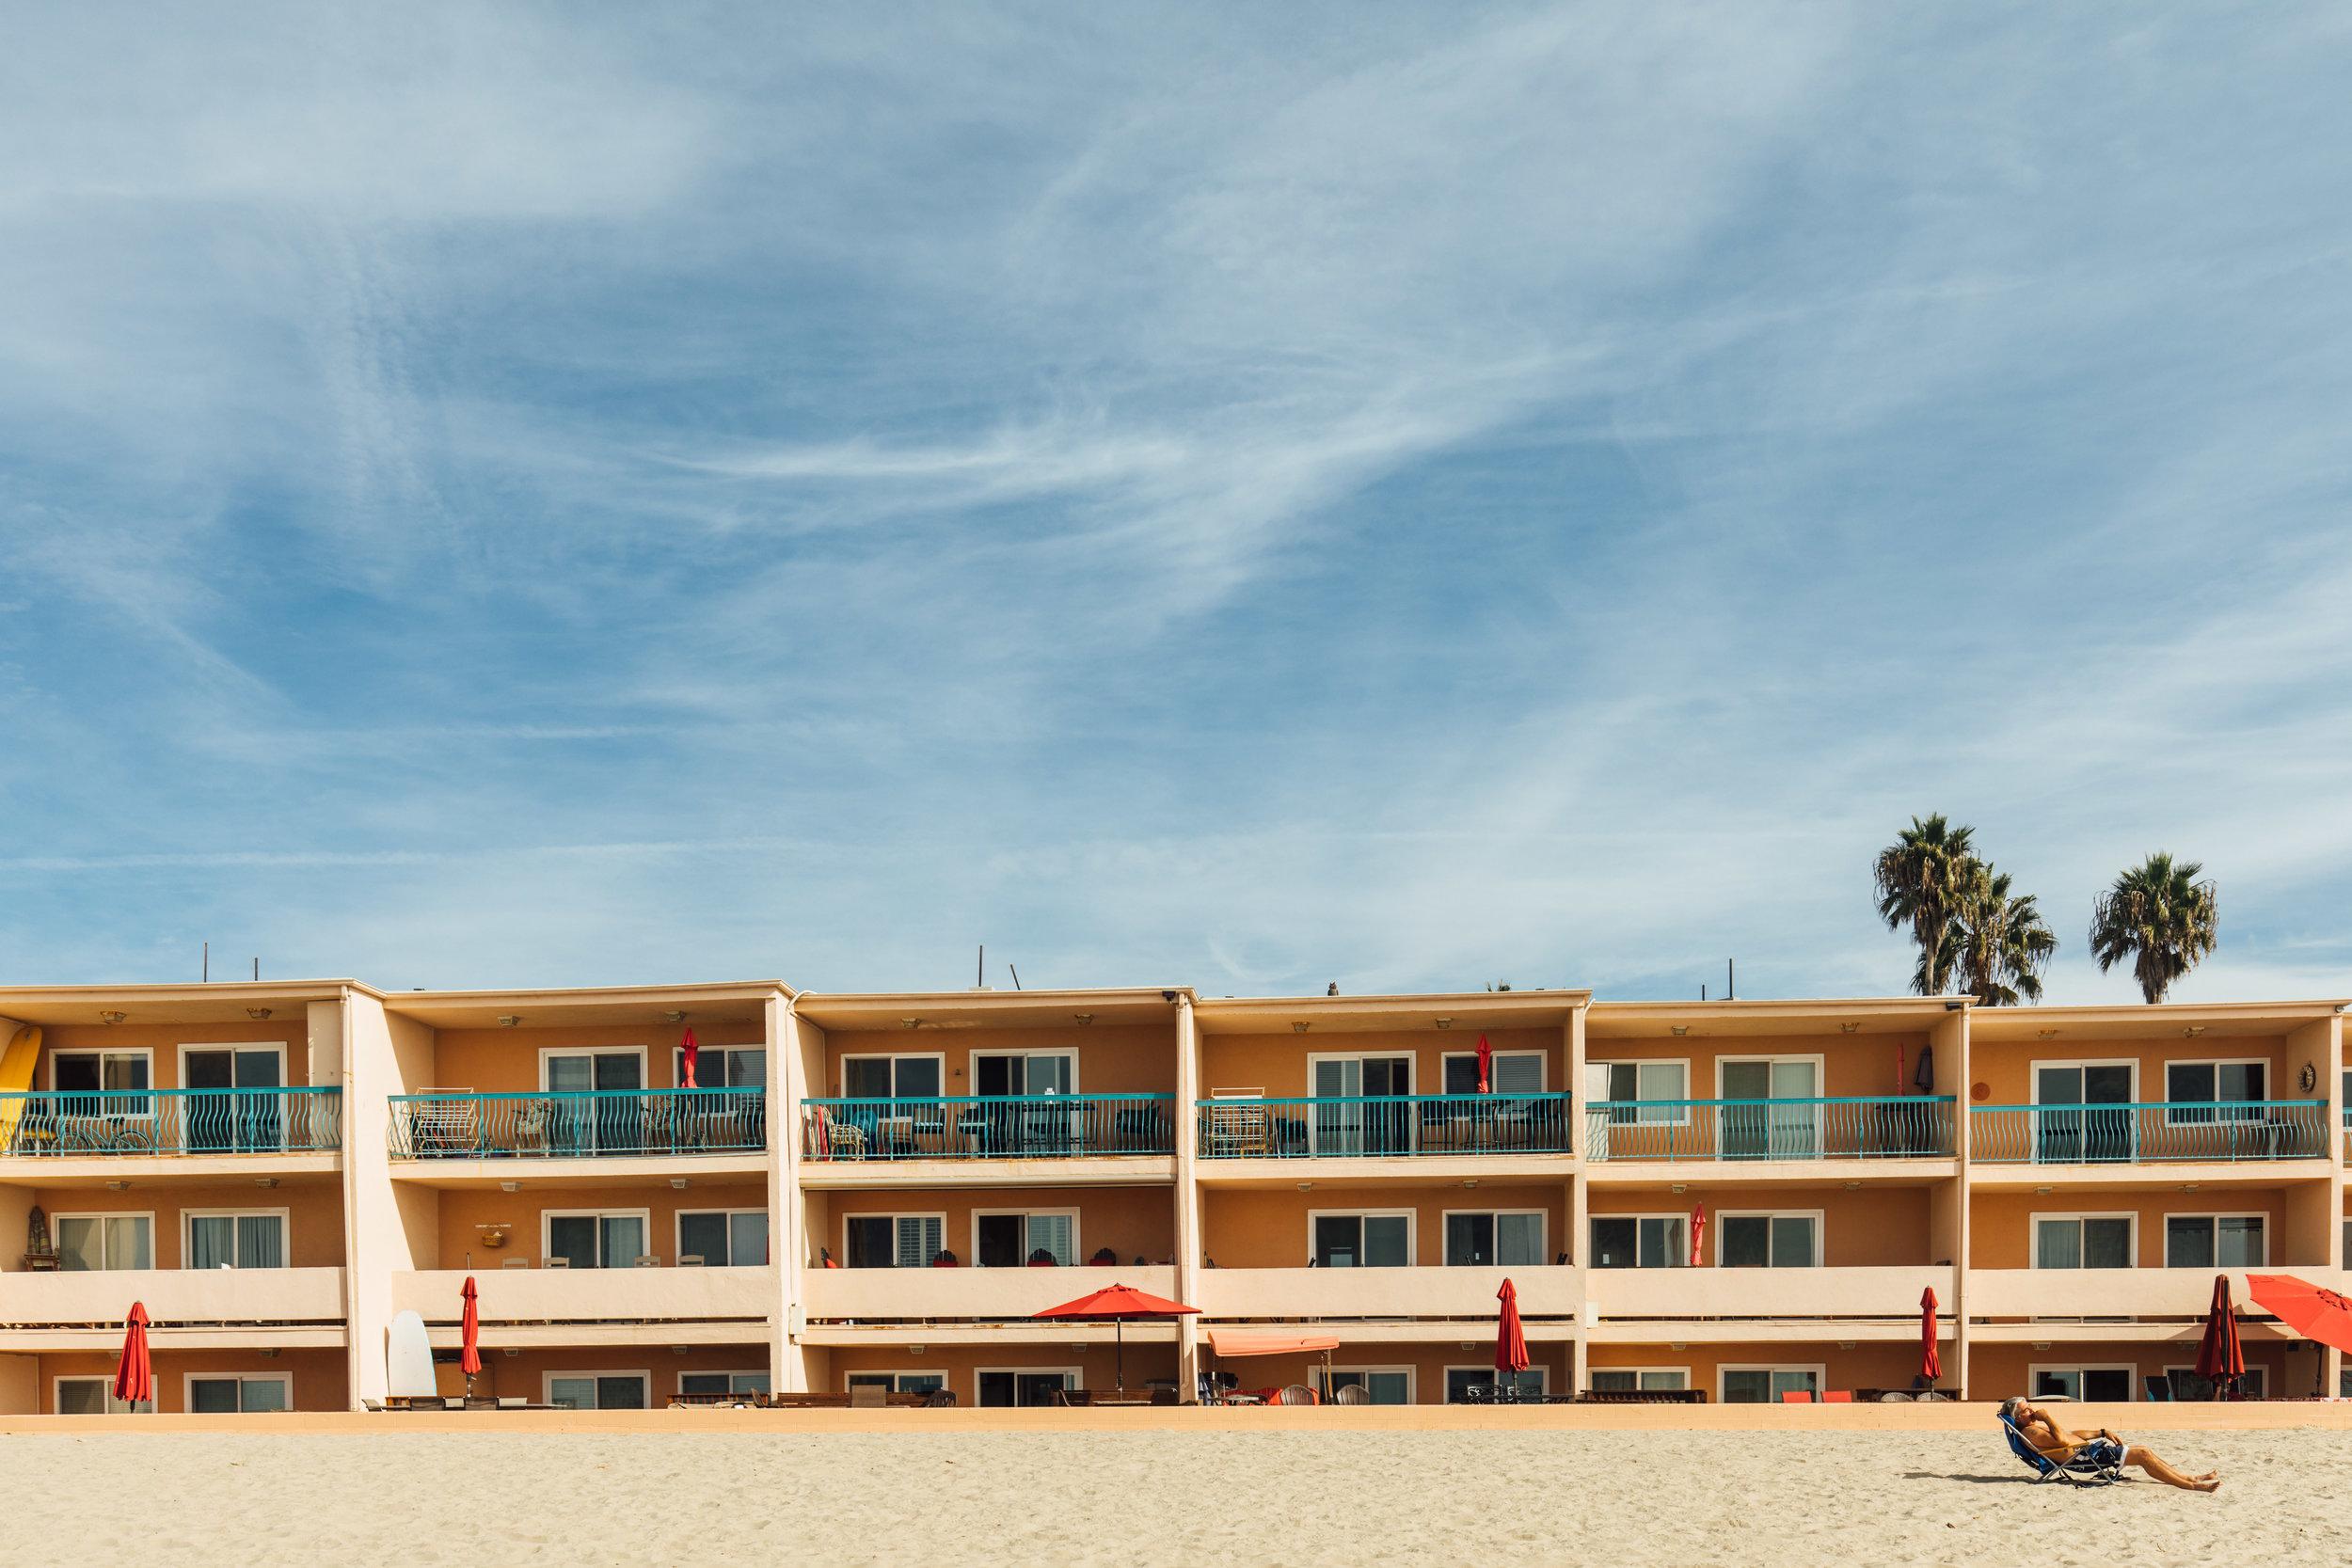 carpinteria-santa-barbara-travel-lifestyle-real-estate-489.jpg